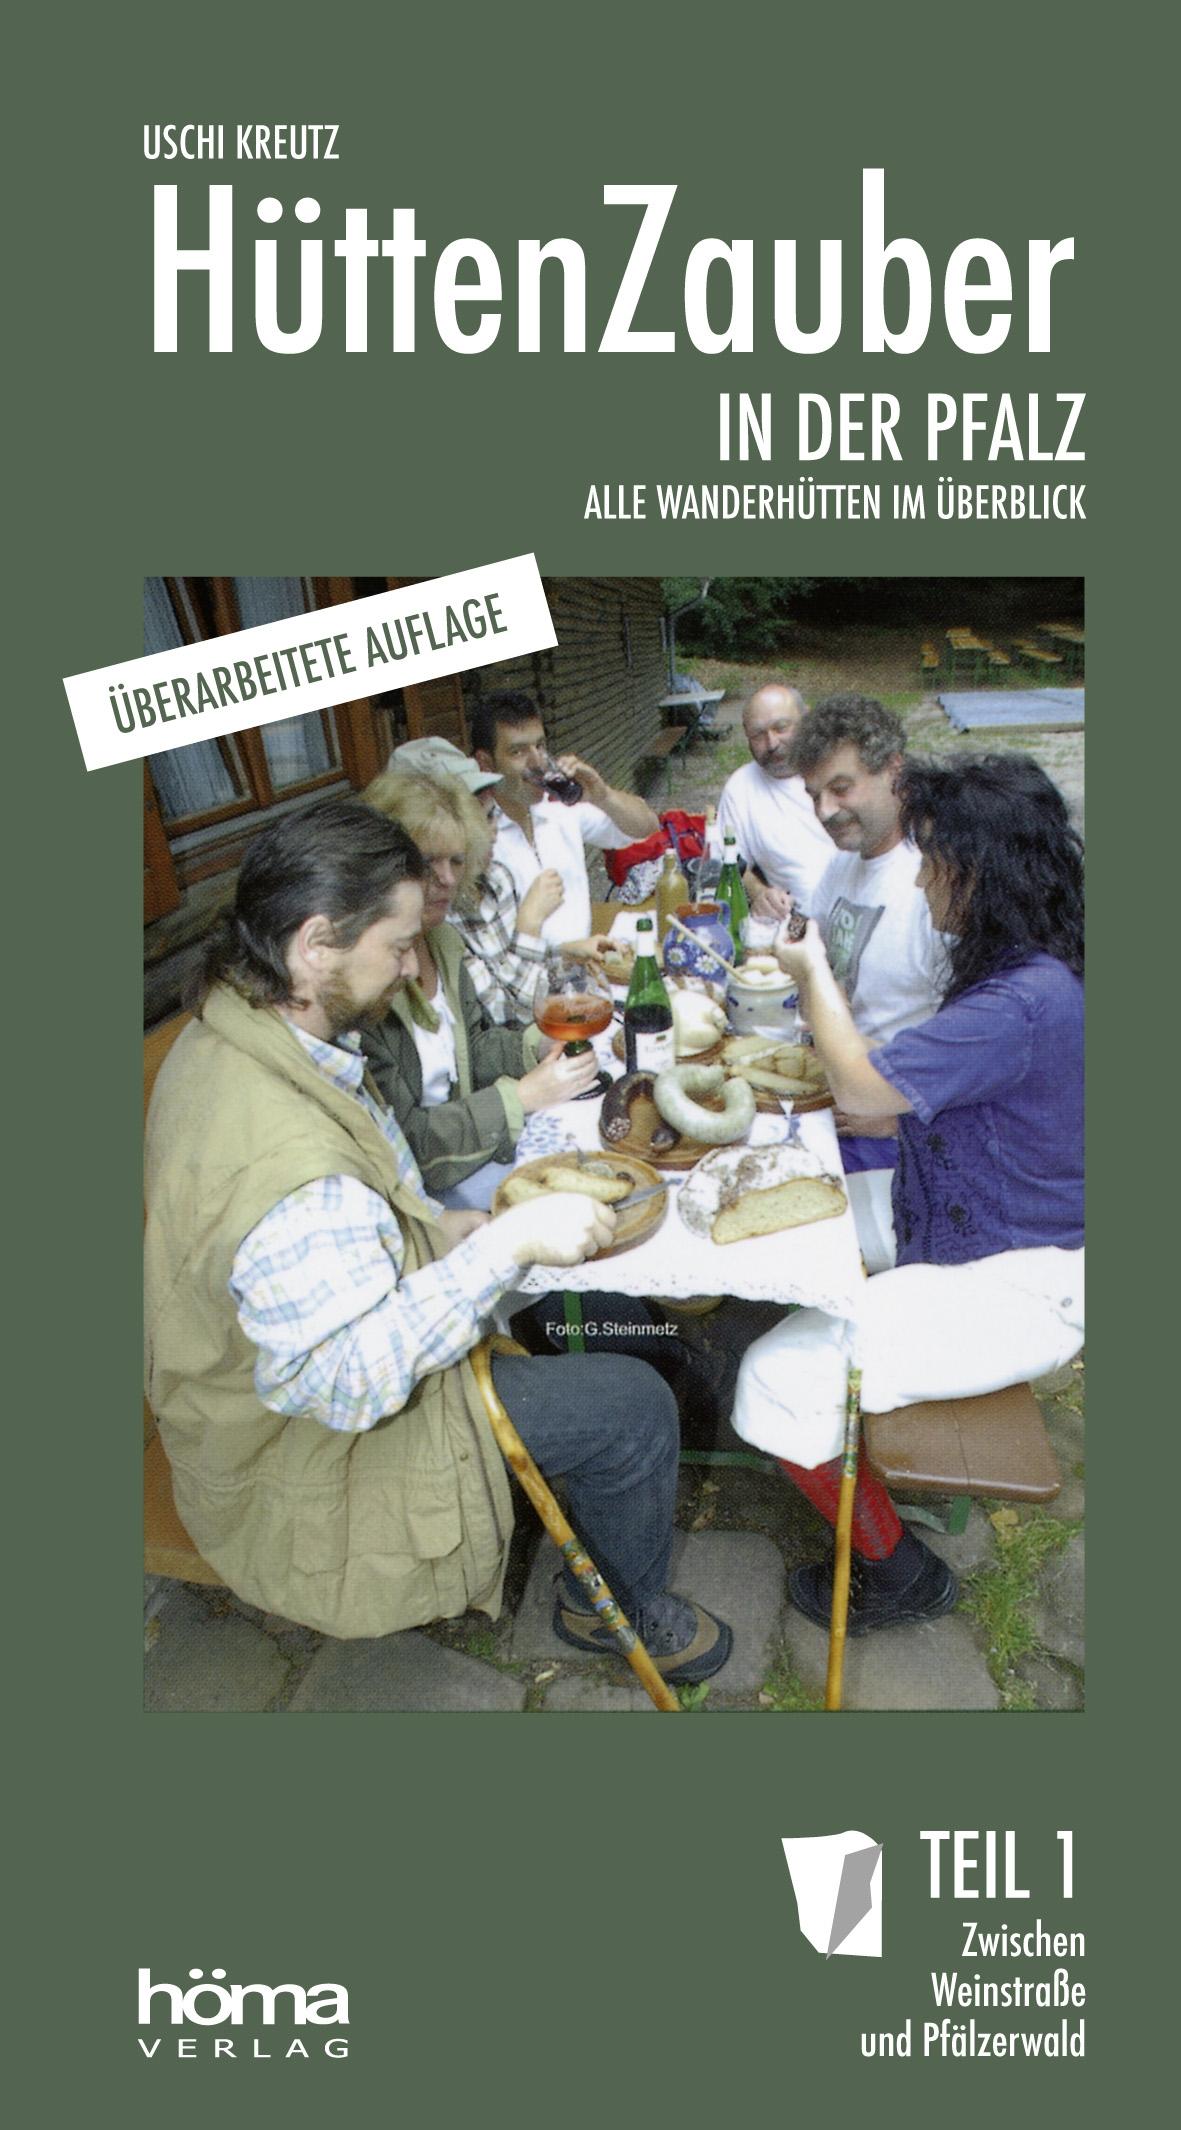 Hüttenzauber in der Pfalz - Alle Wanderhütten i...